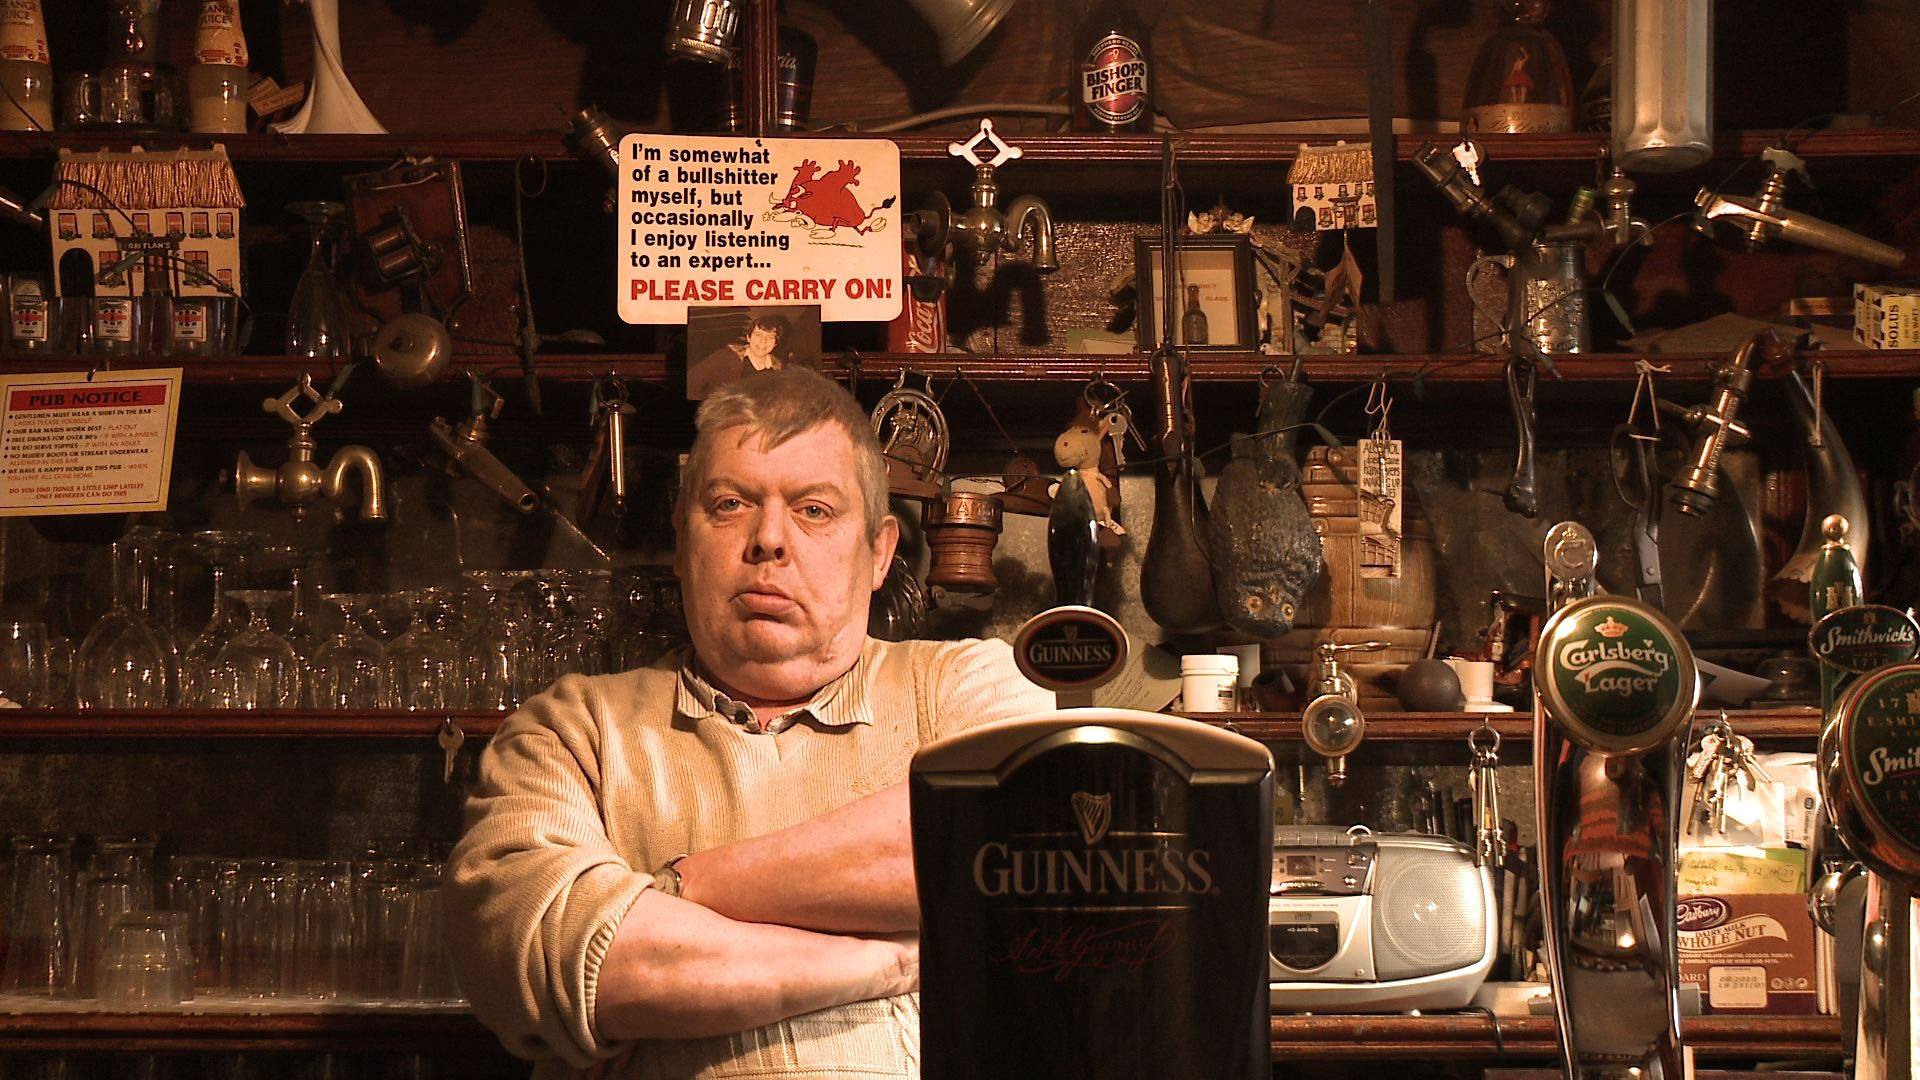 Alex Fagan's The Irish Pub